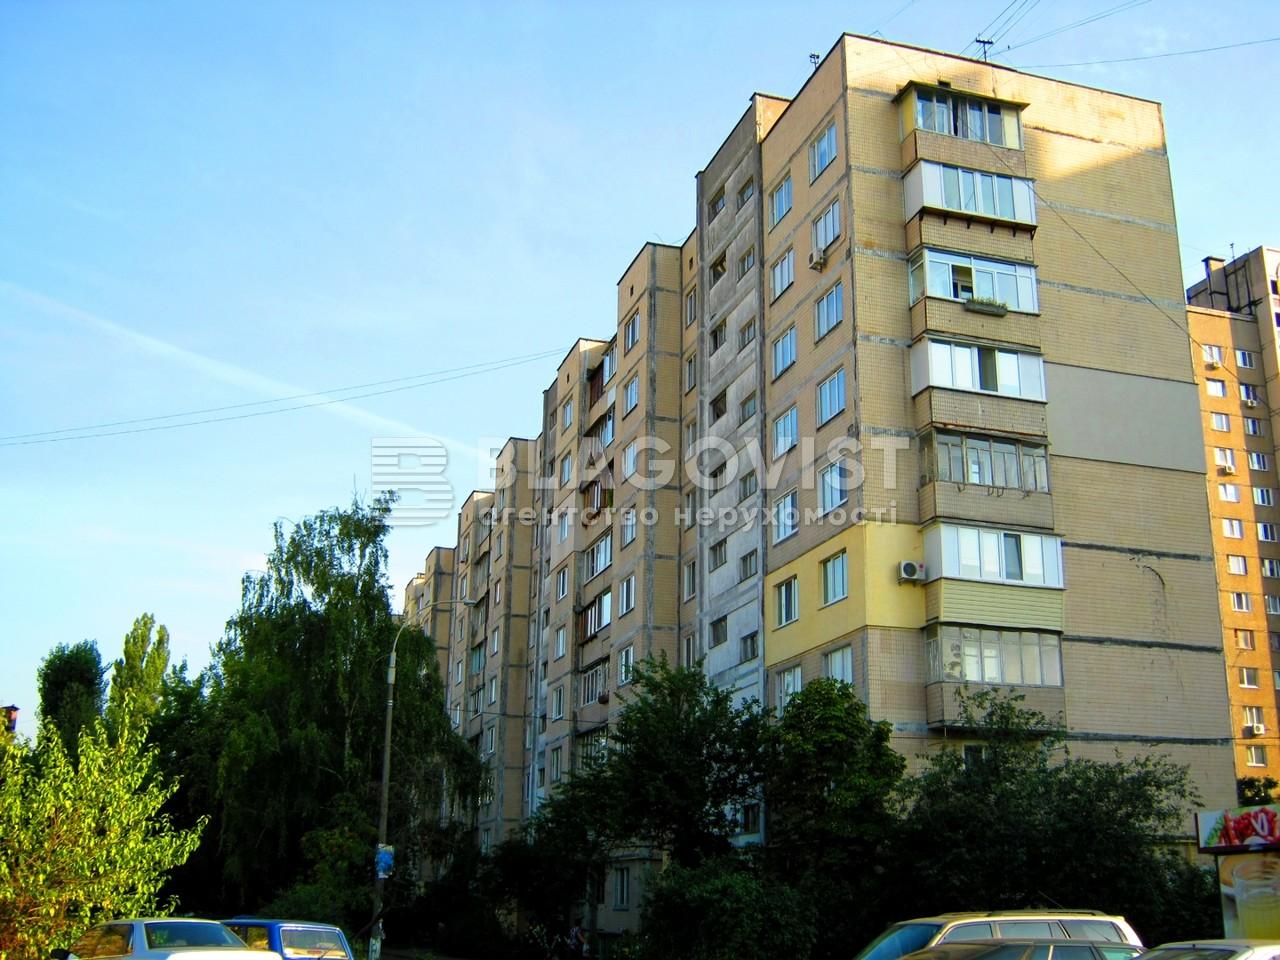 Квартира A-109123, Харківське шосе, 174б, Київ - Фото 3